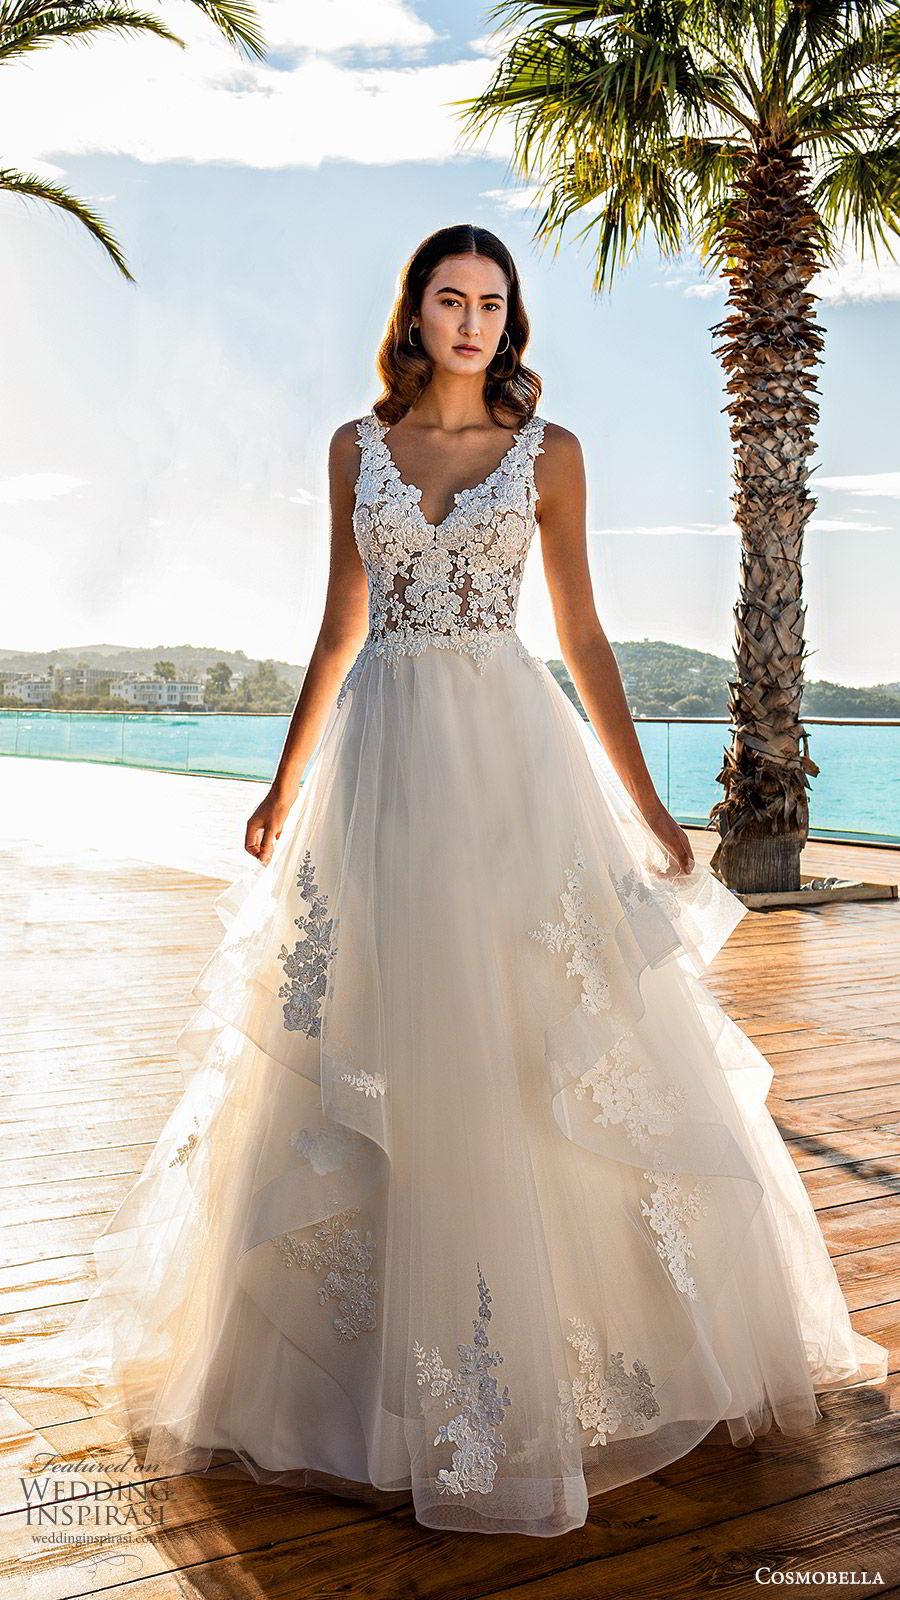 cosmobella 2020 bridal sleeveless thick straps lace bodice a line ball gown wedding dress (9) romantic princess low back chapel train mv